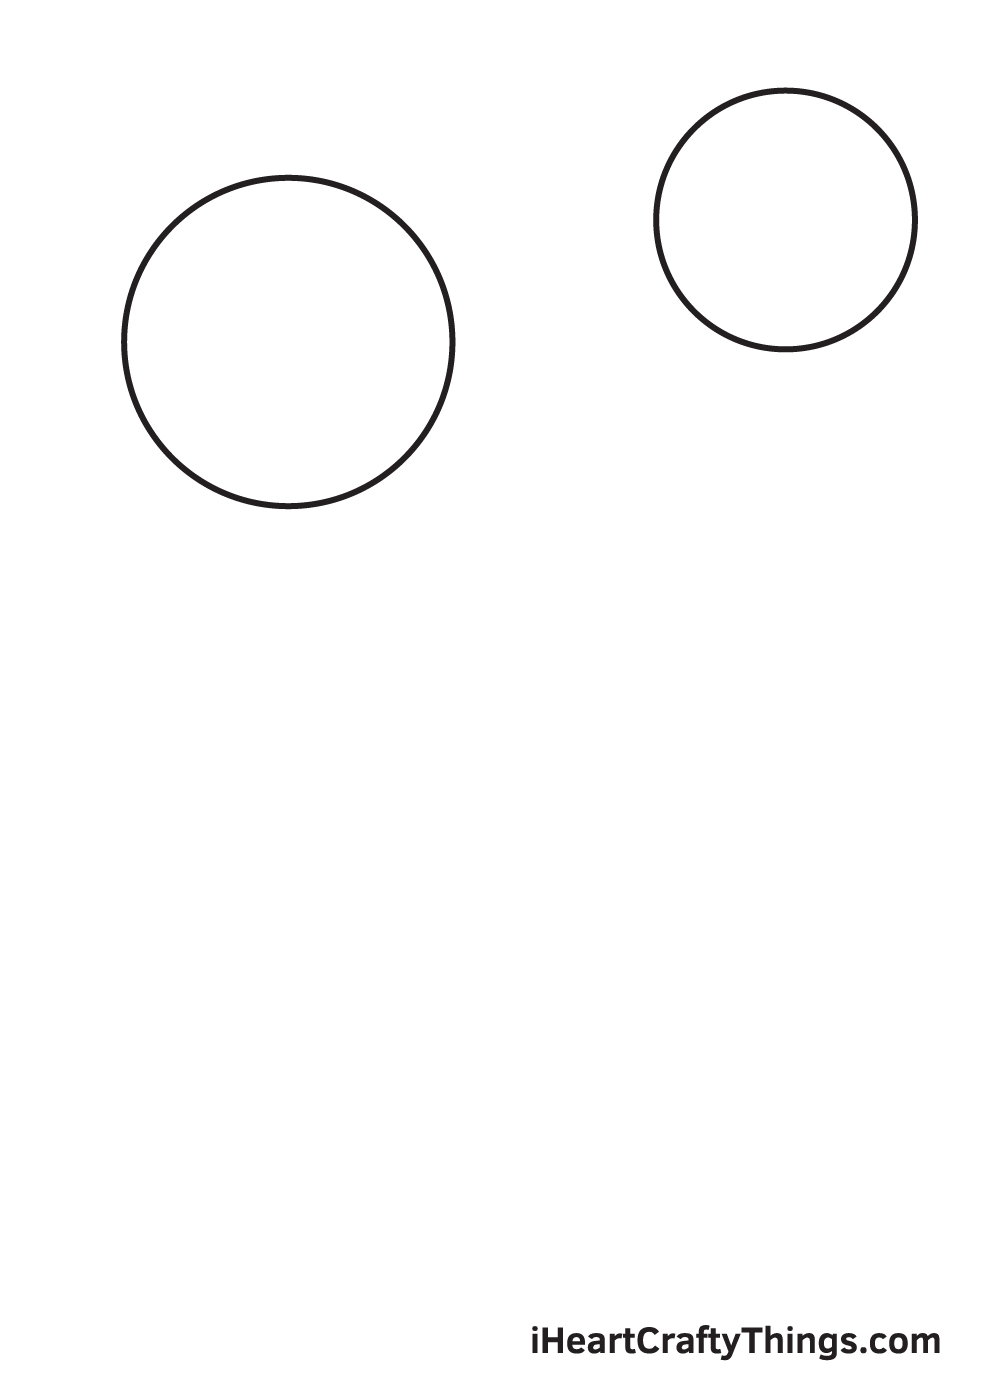 galaxy drawing - step 2